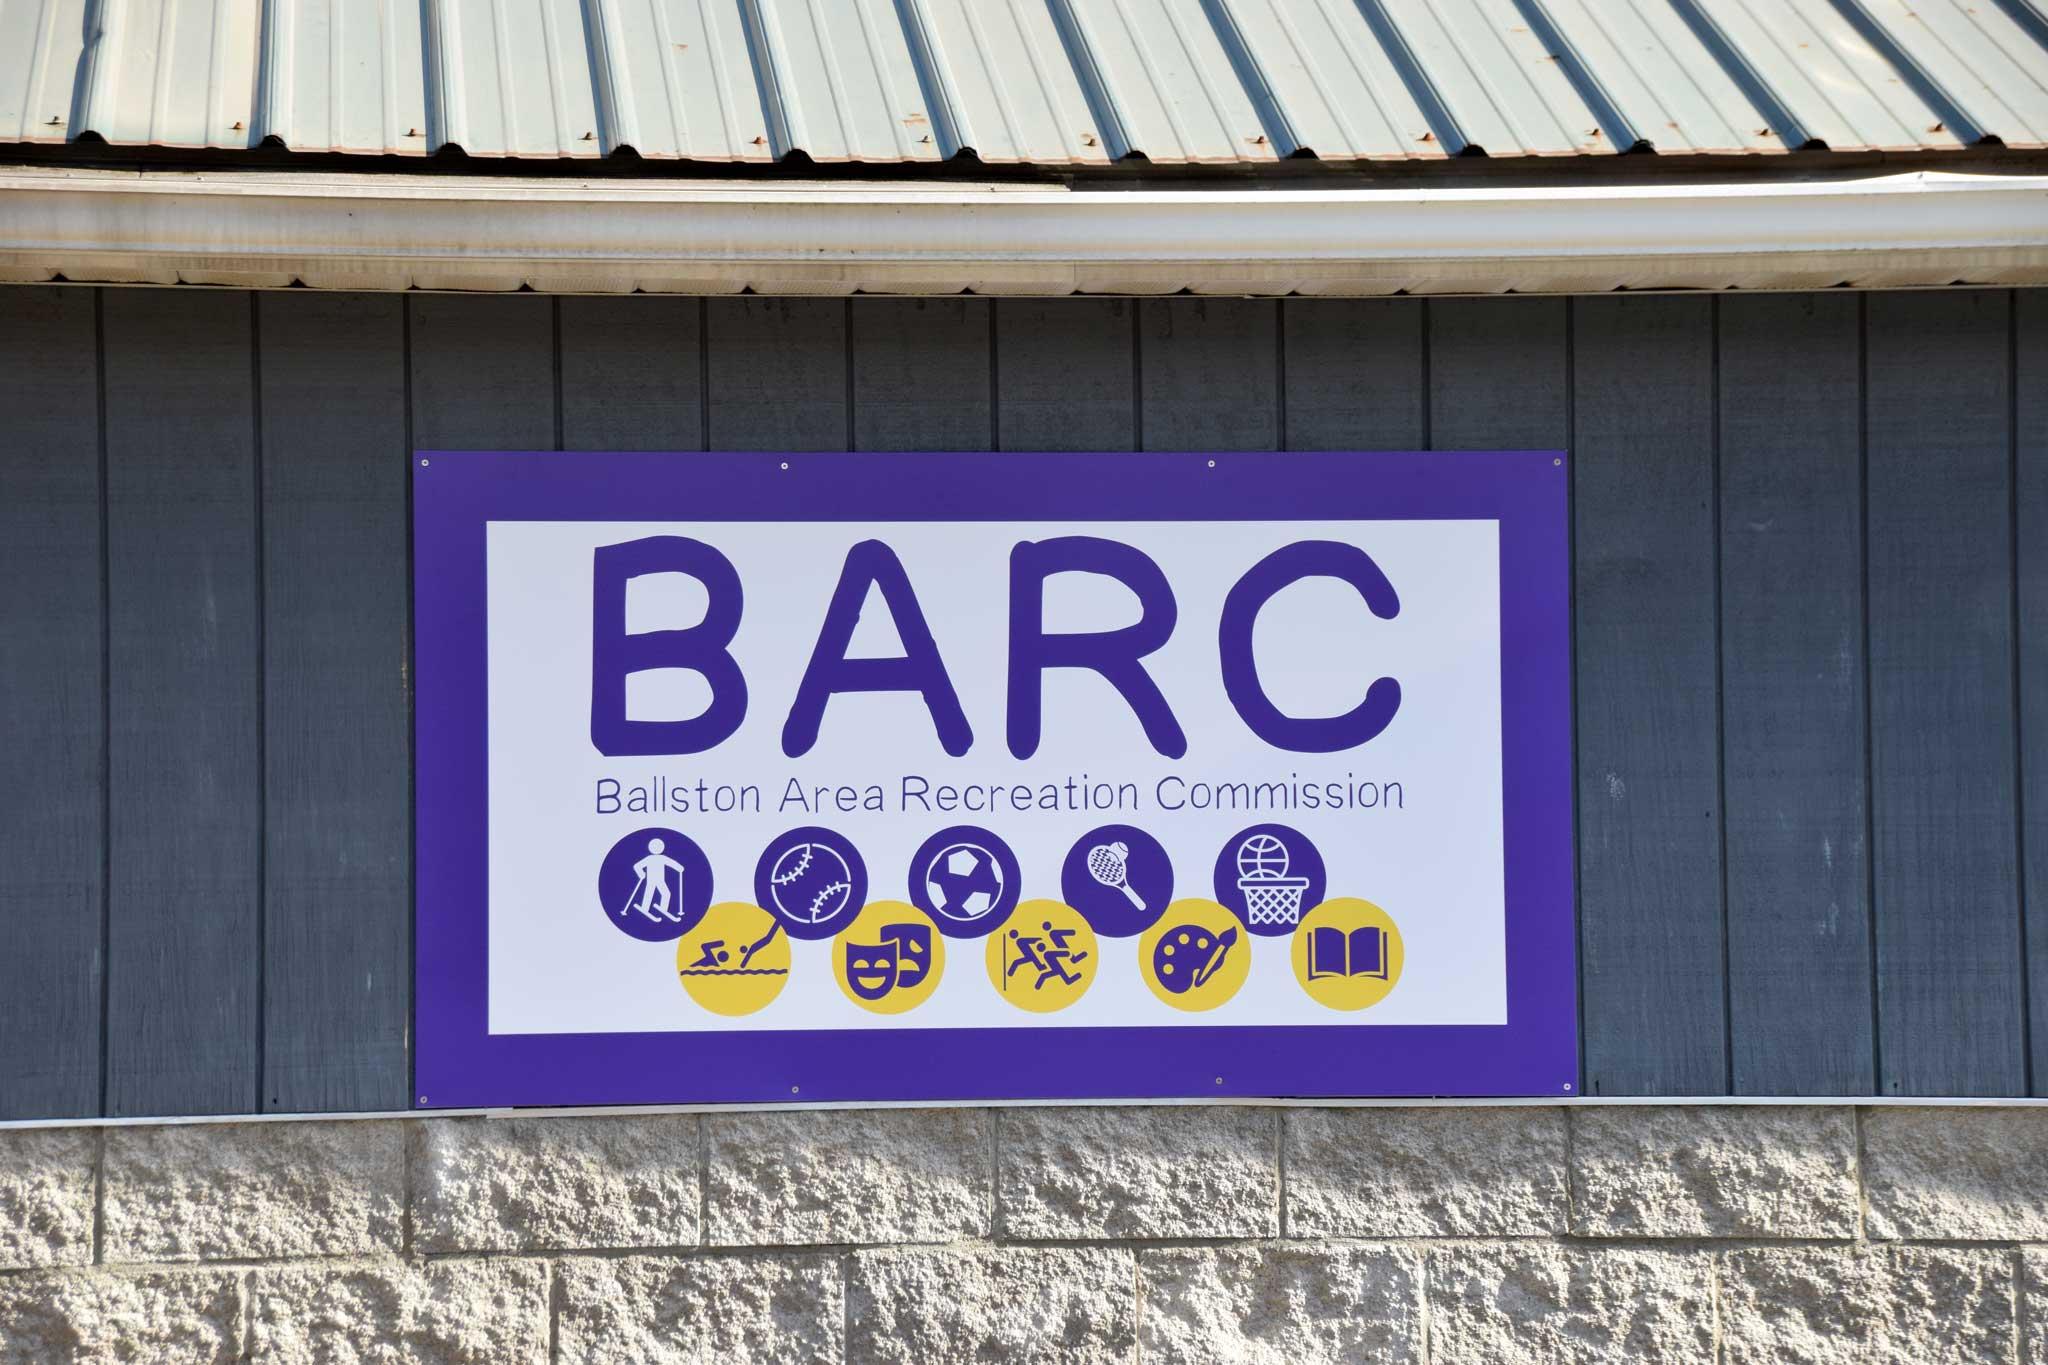 BARC :: Ballston Area Recreation Commission